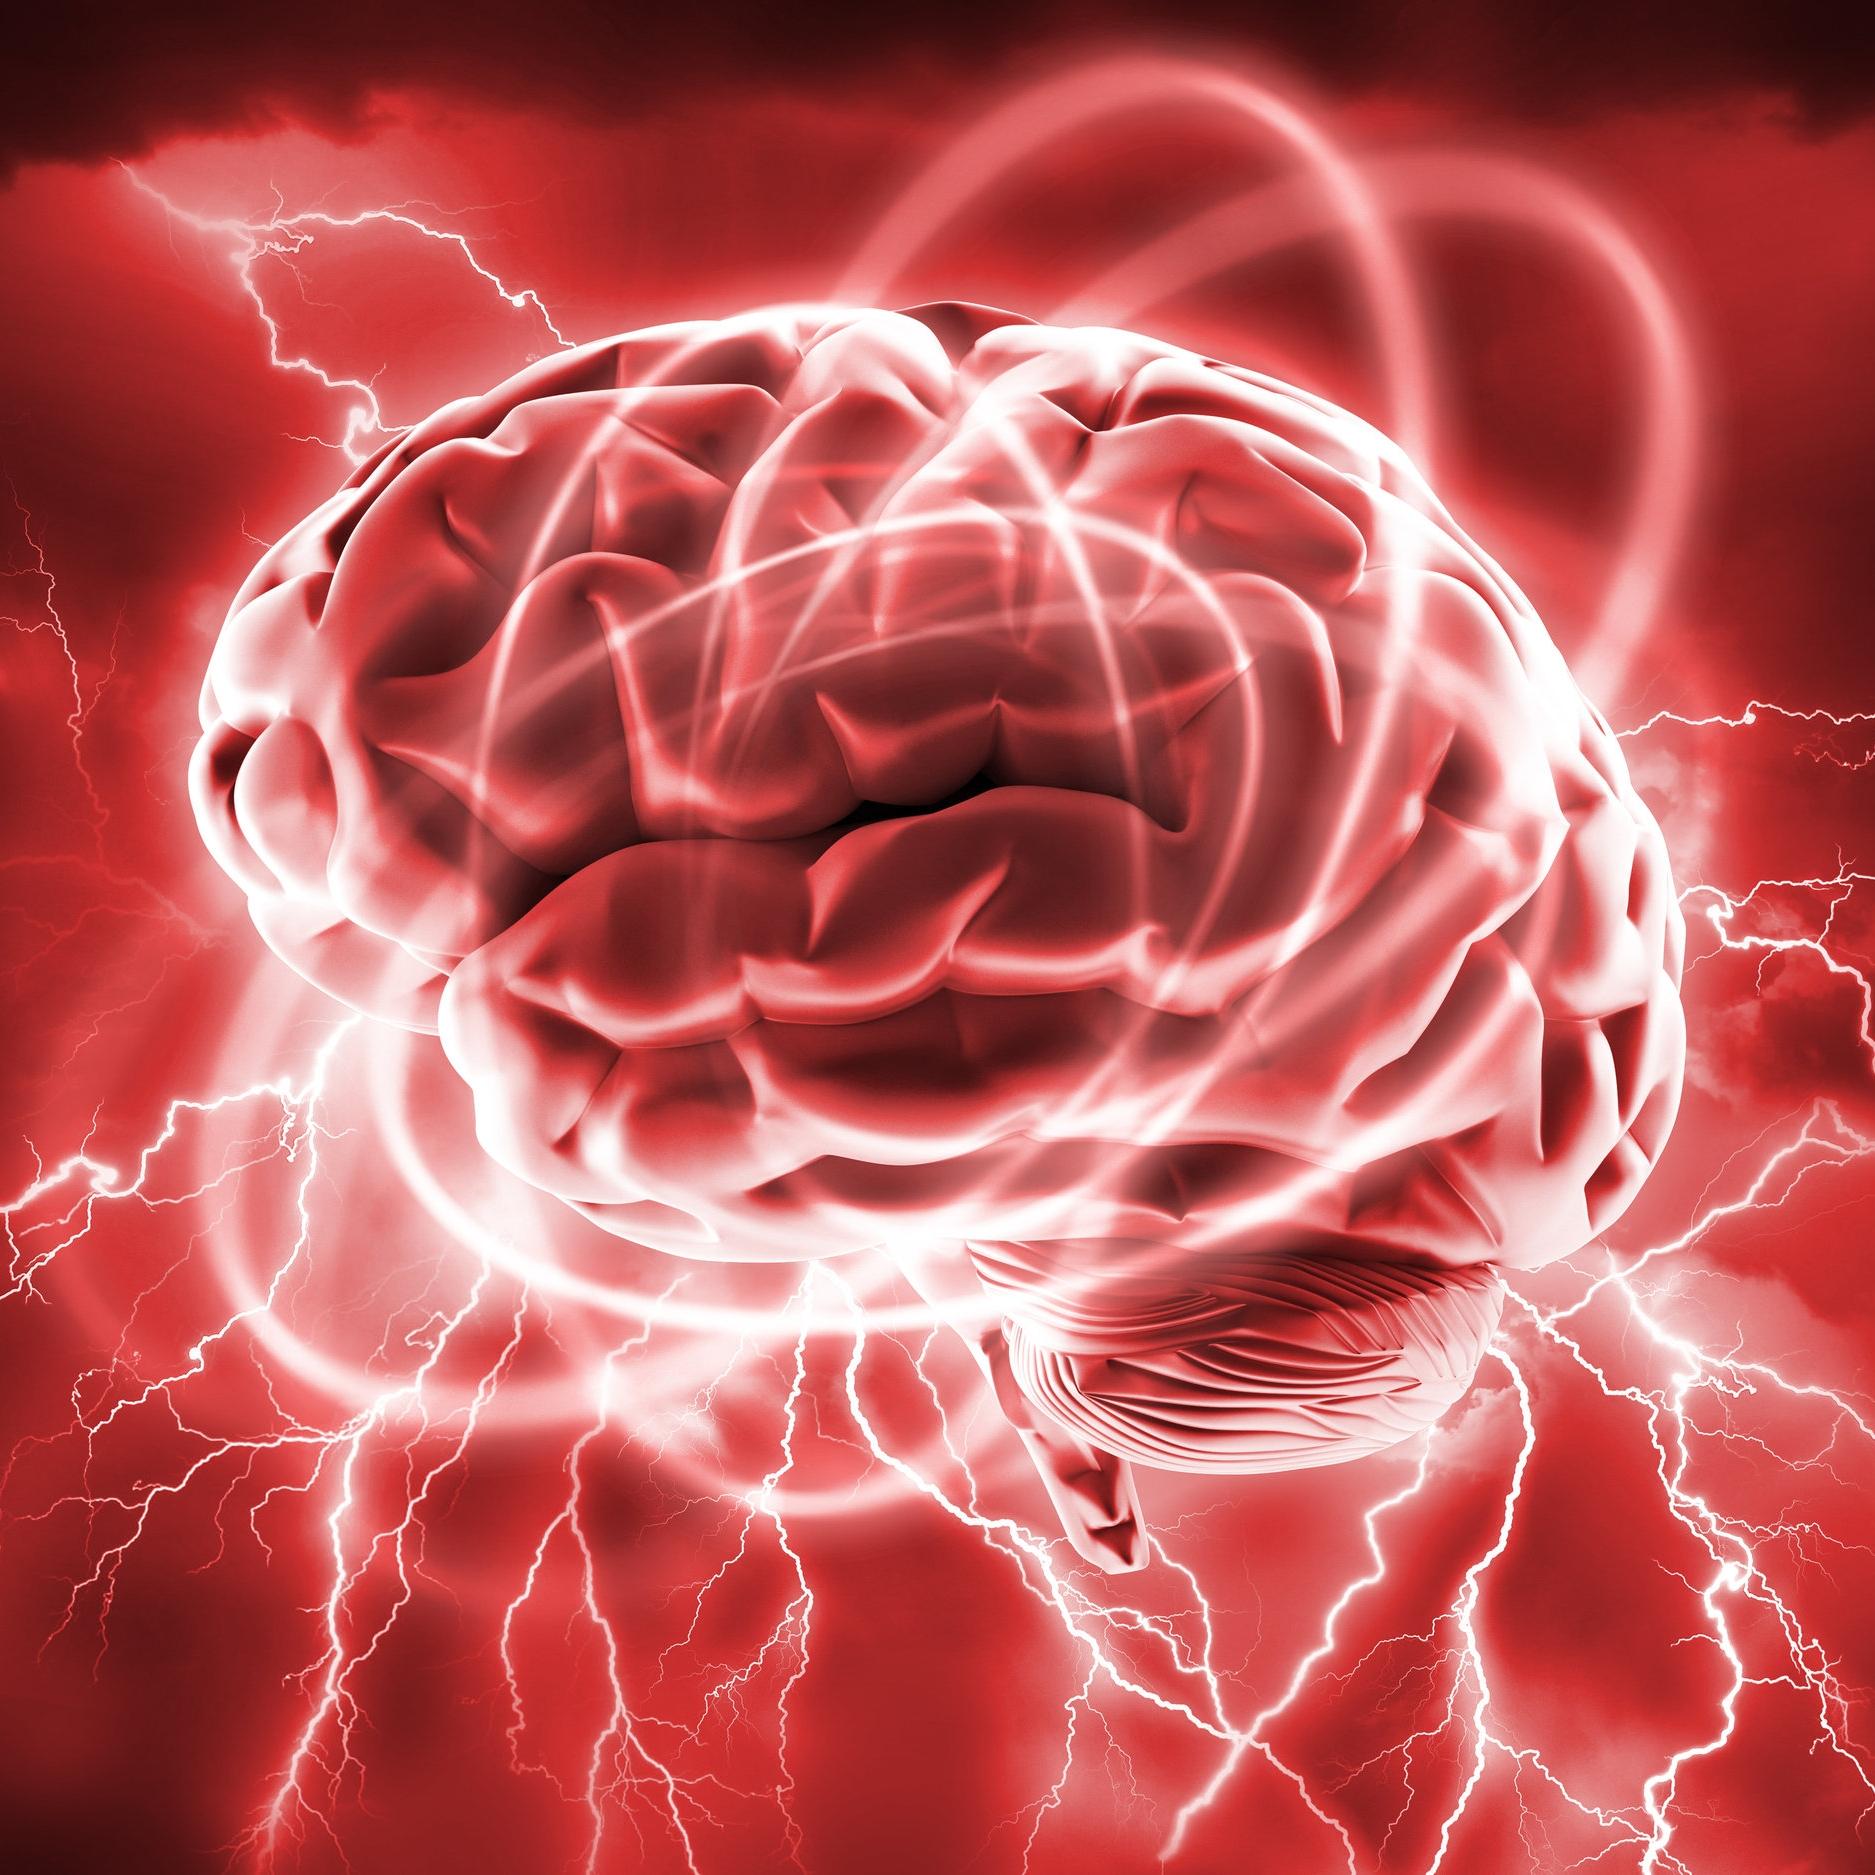 CA Workman's' Compensation Brain Injury Claims